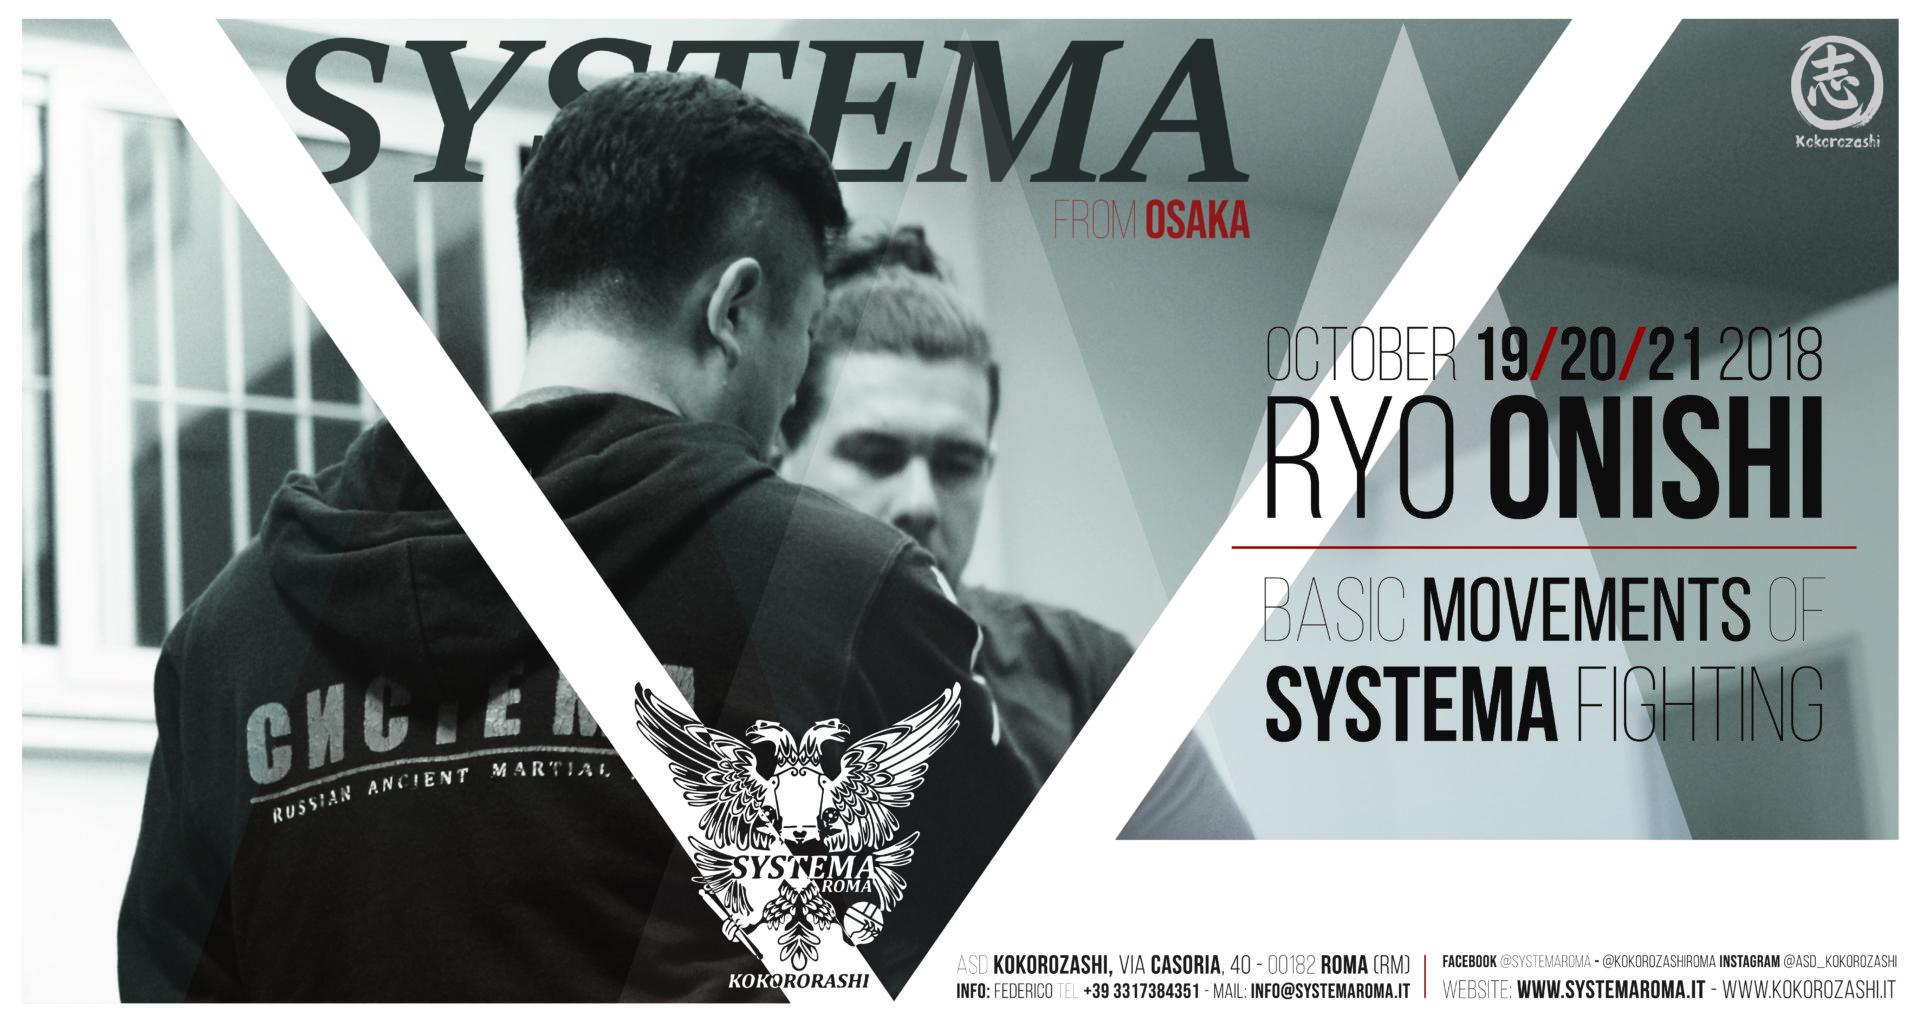 Systema seminar with Instructor Ryo Onishi